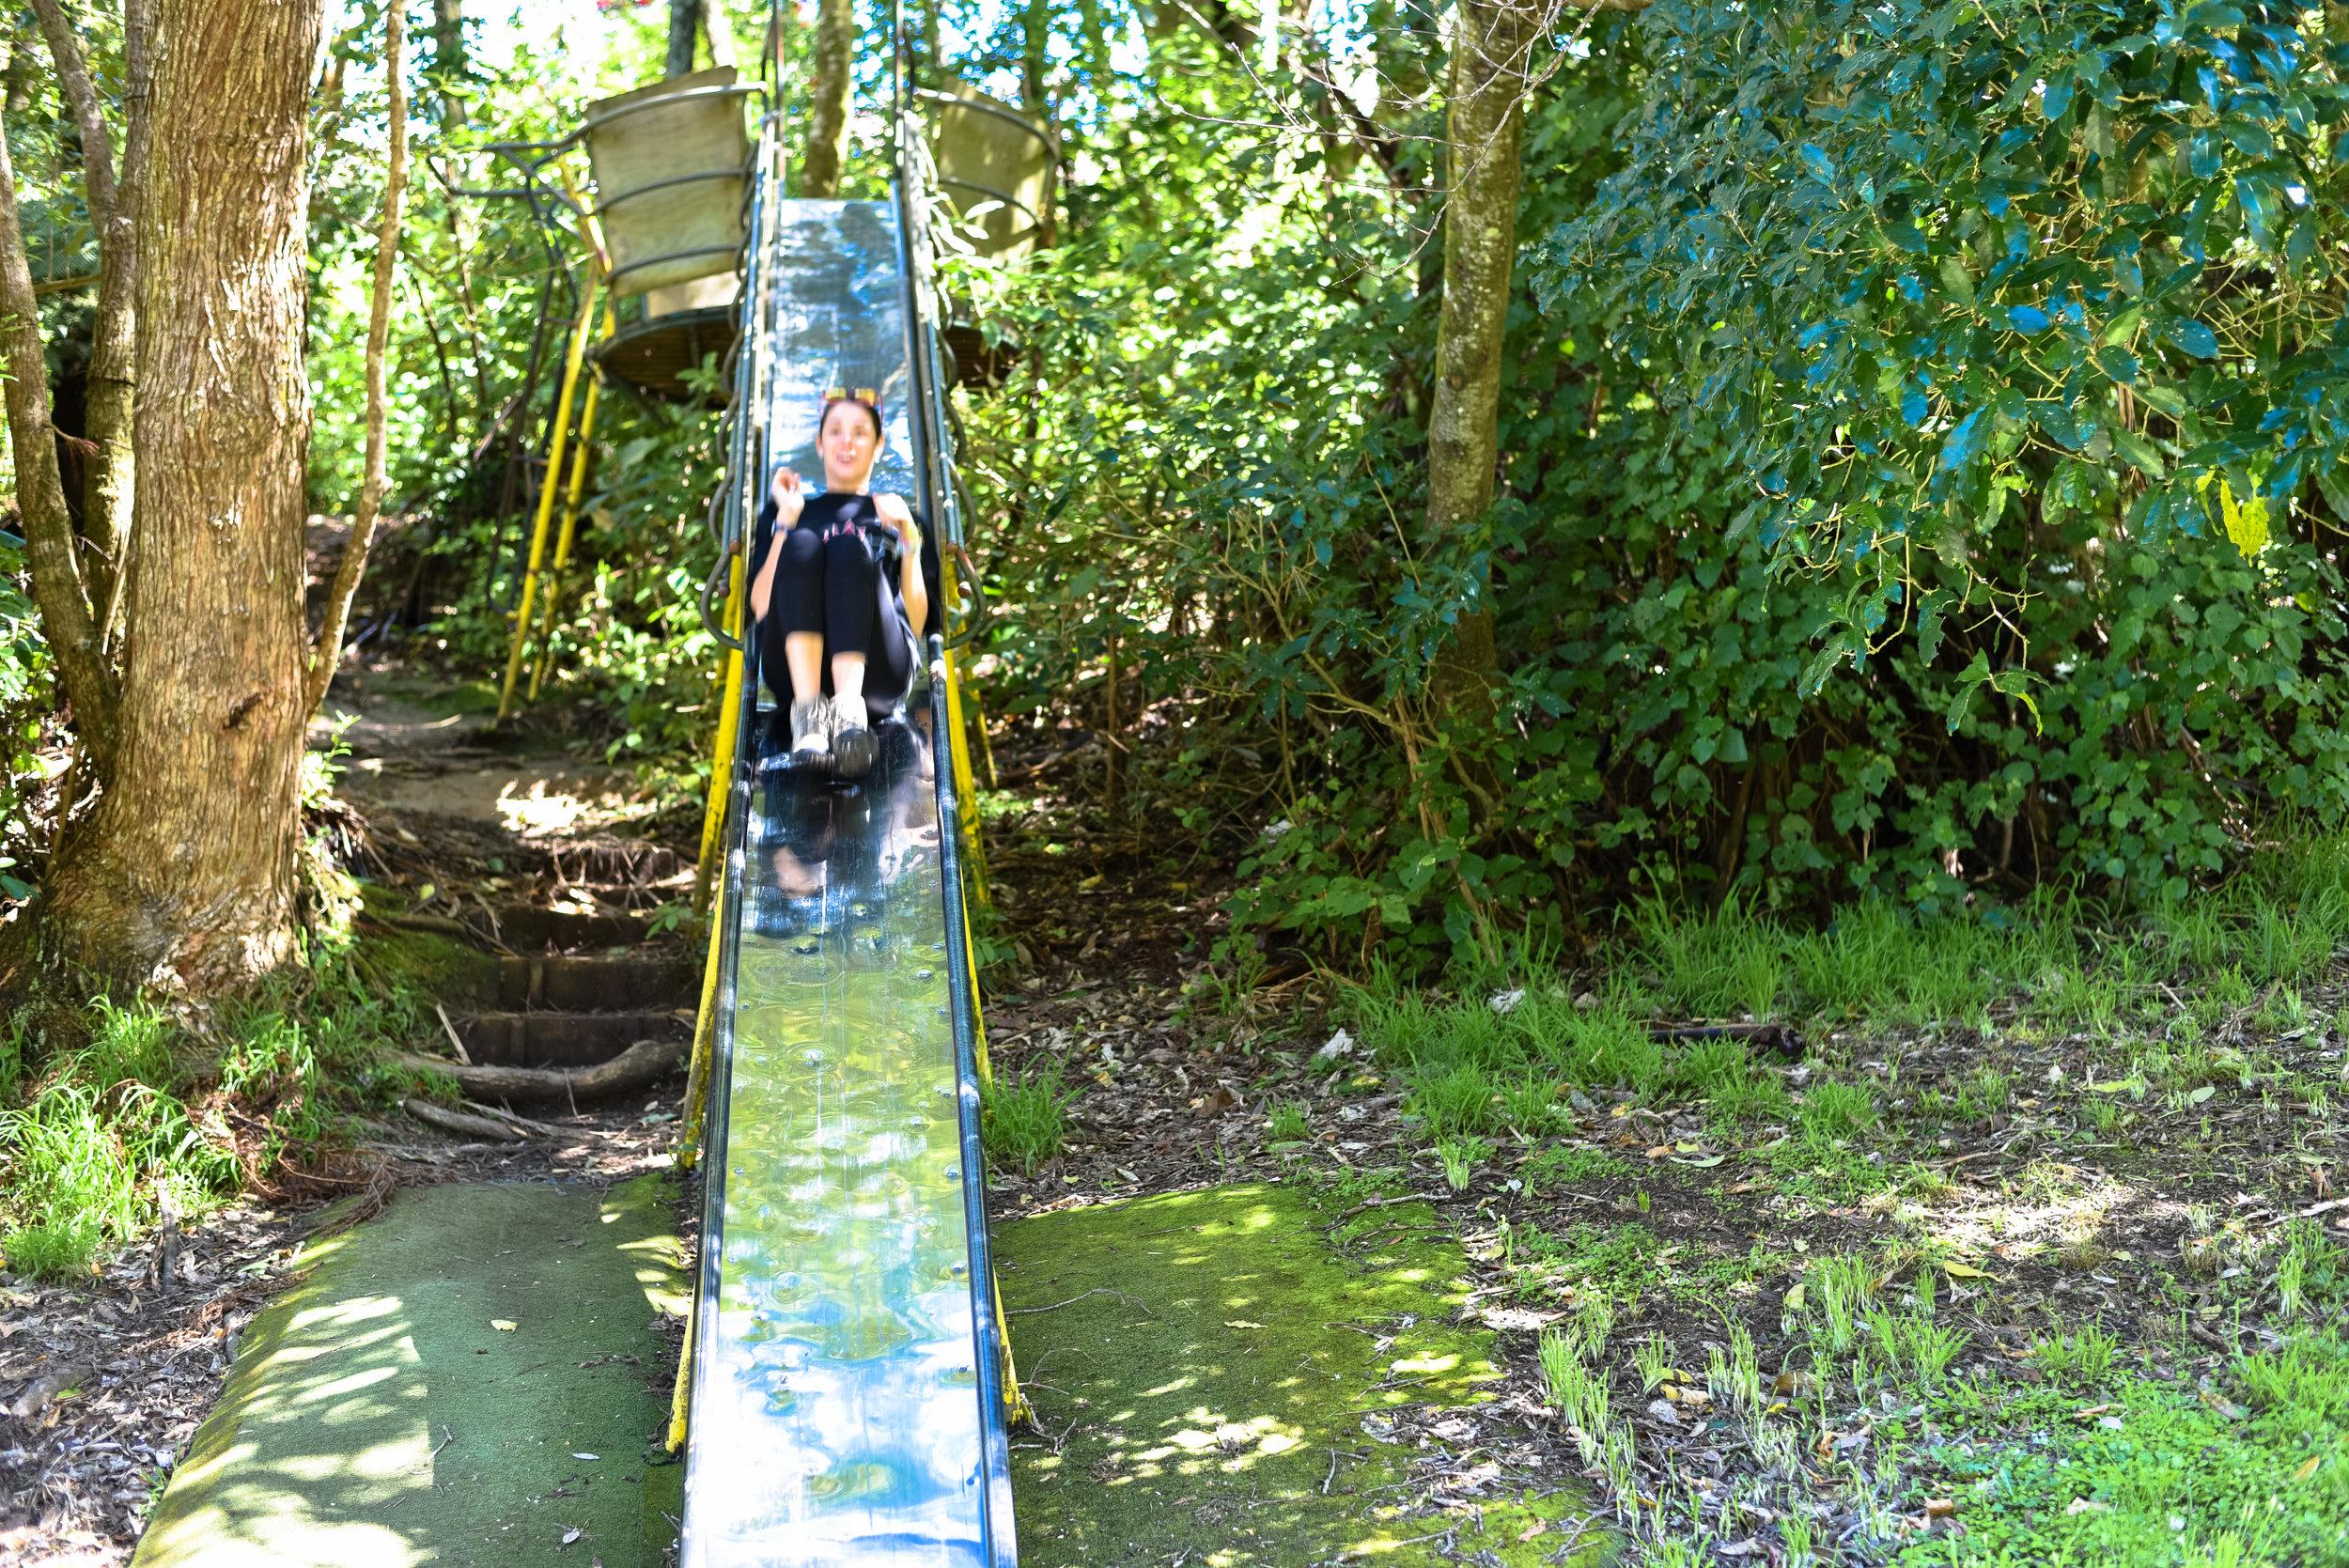 Bad capture on my part.Brigid enjoying herself on the slide